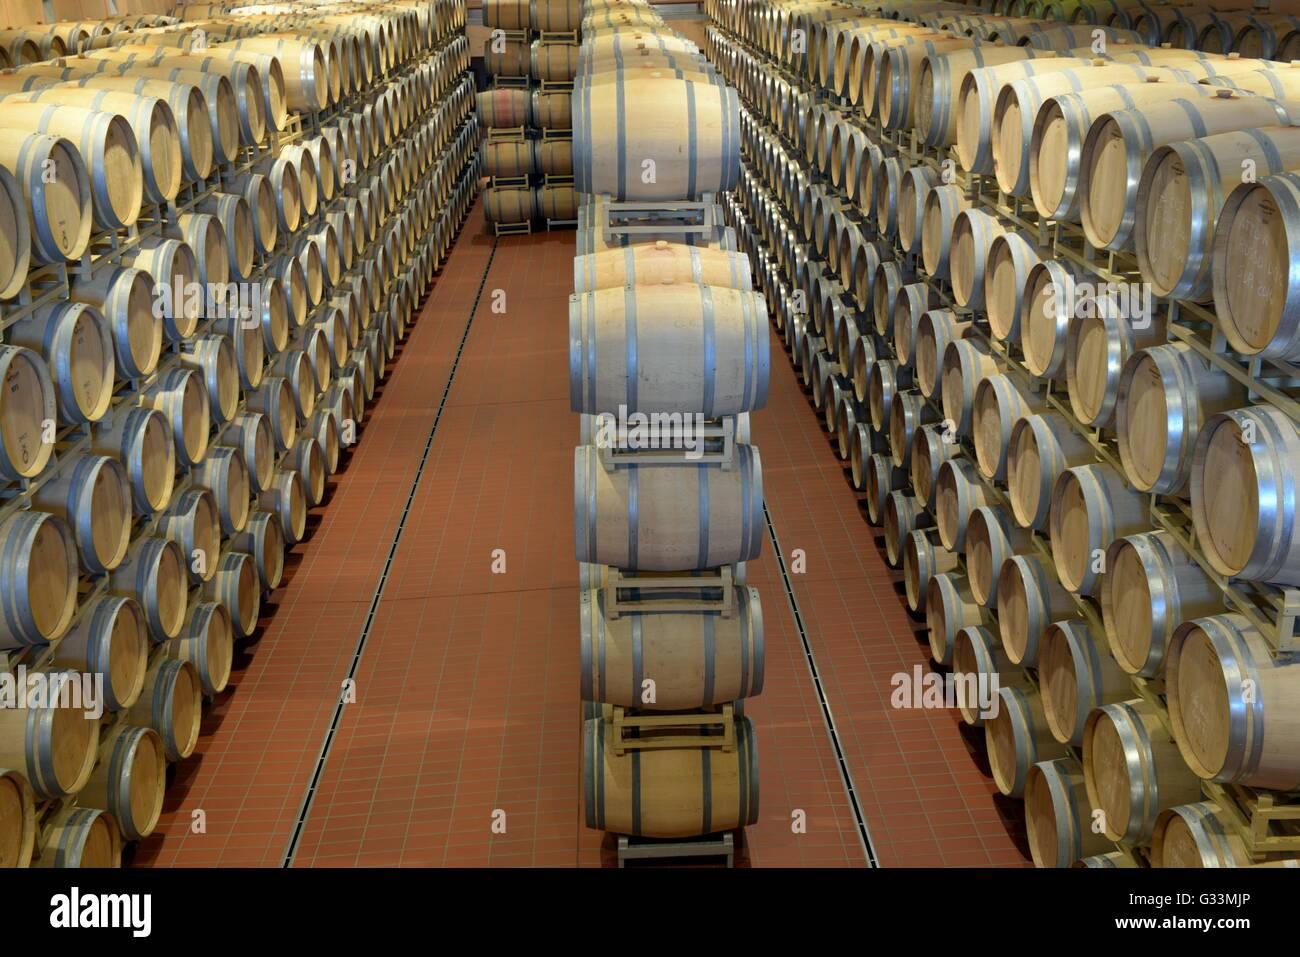 The cellar of Marchesi Antinori in Tenuta Guado al Tasso, Bolgheri, Livorno, Tuscany,Italy, January 09, 2015    - Stock Image